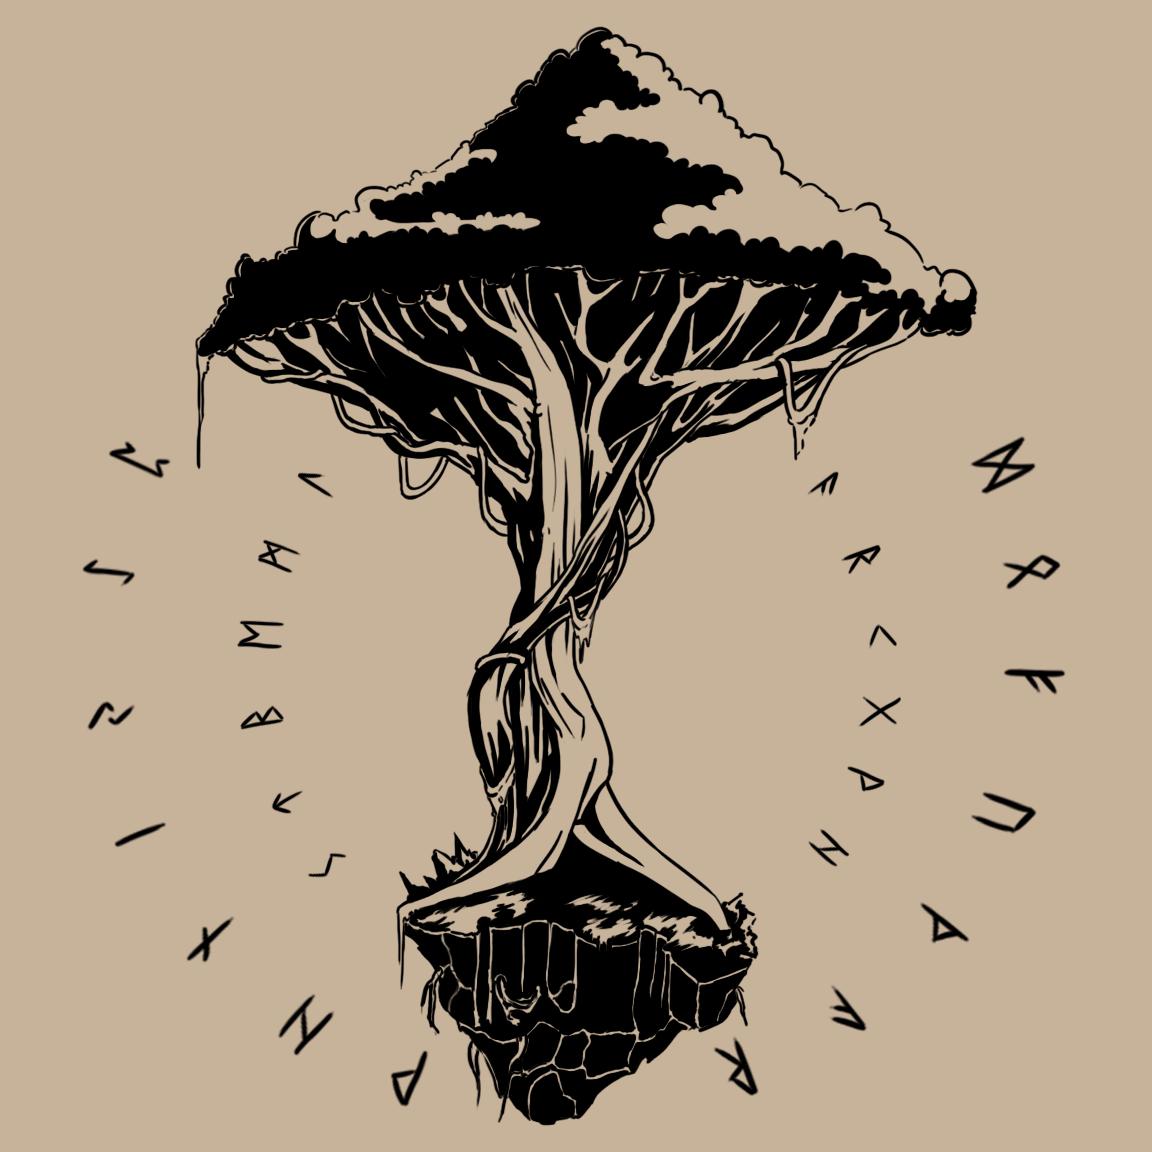 Yggdrasil By Fuindagnir On Deviantart Yggdrasil Tattoo Yggdrasil Tree Yggdrasil